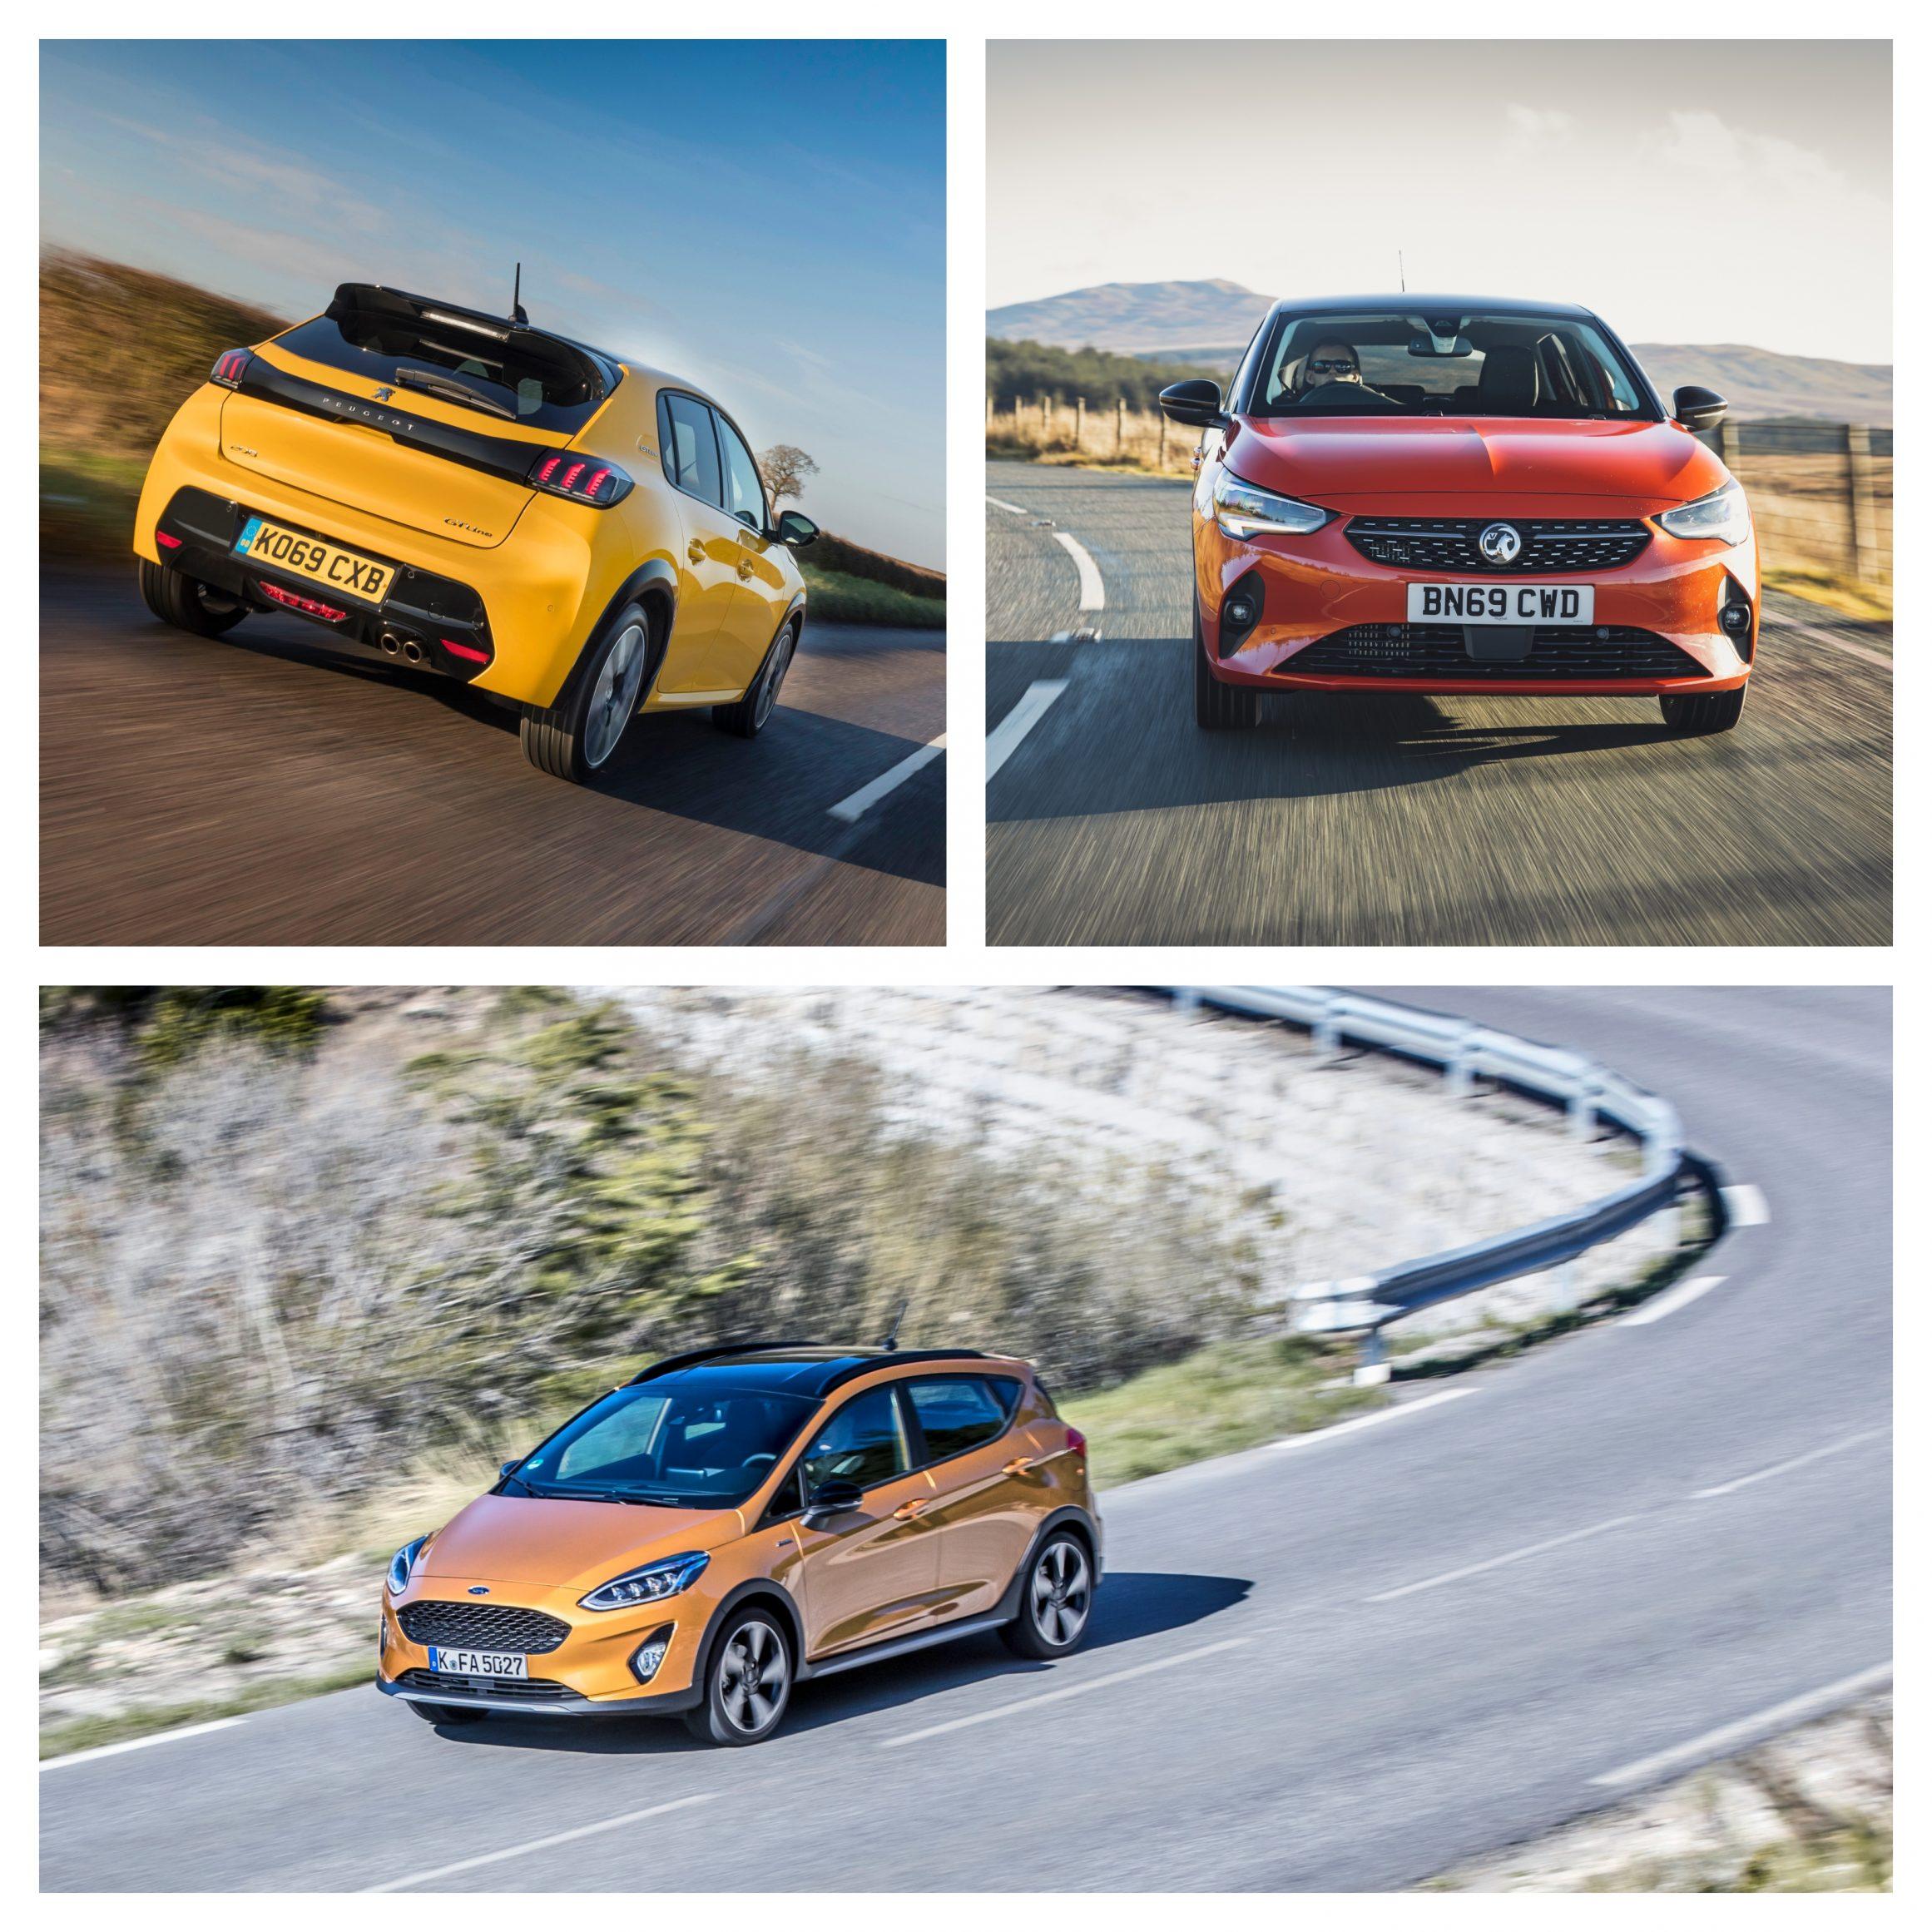 Corsa vs Fiesta vs Peugeot 208 how they drive